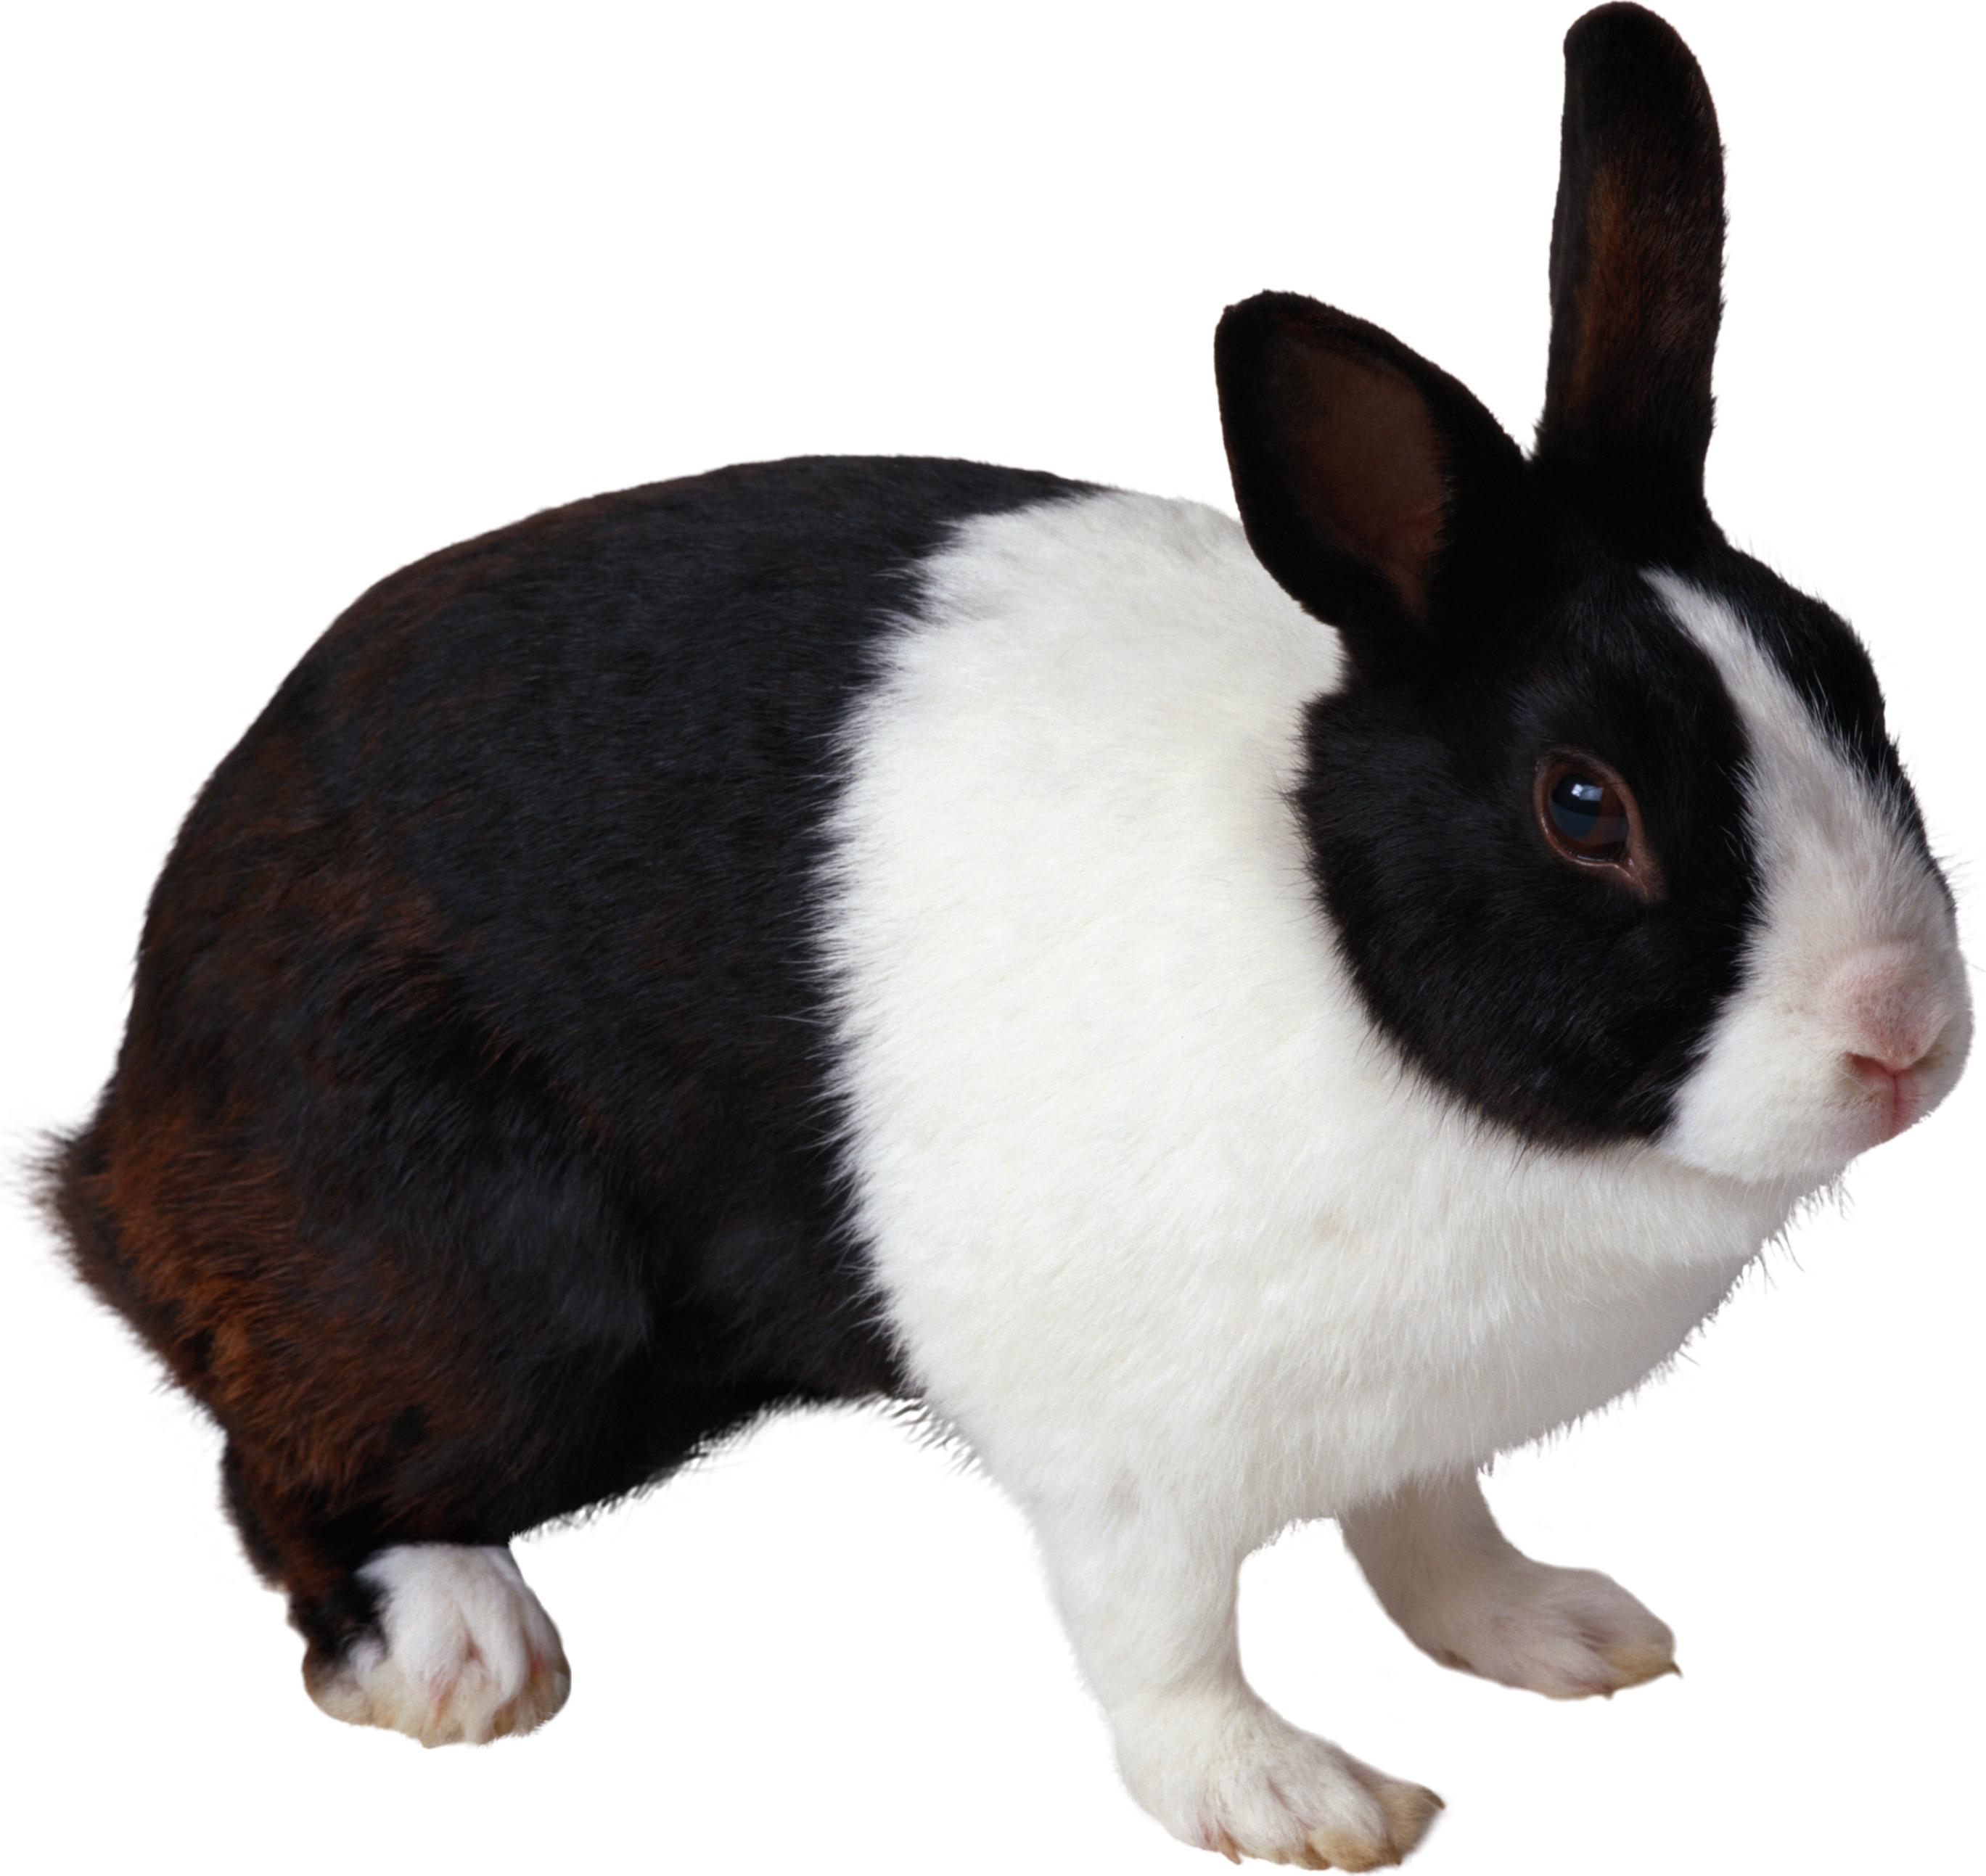 Rabbit Png Black And White Rabbit Rabbit Png Rabbit